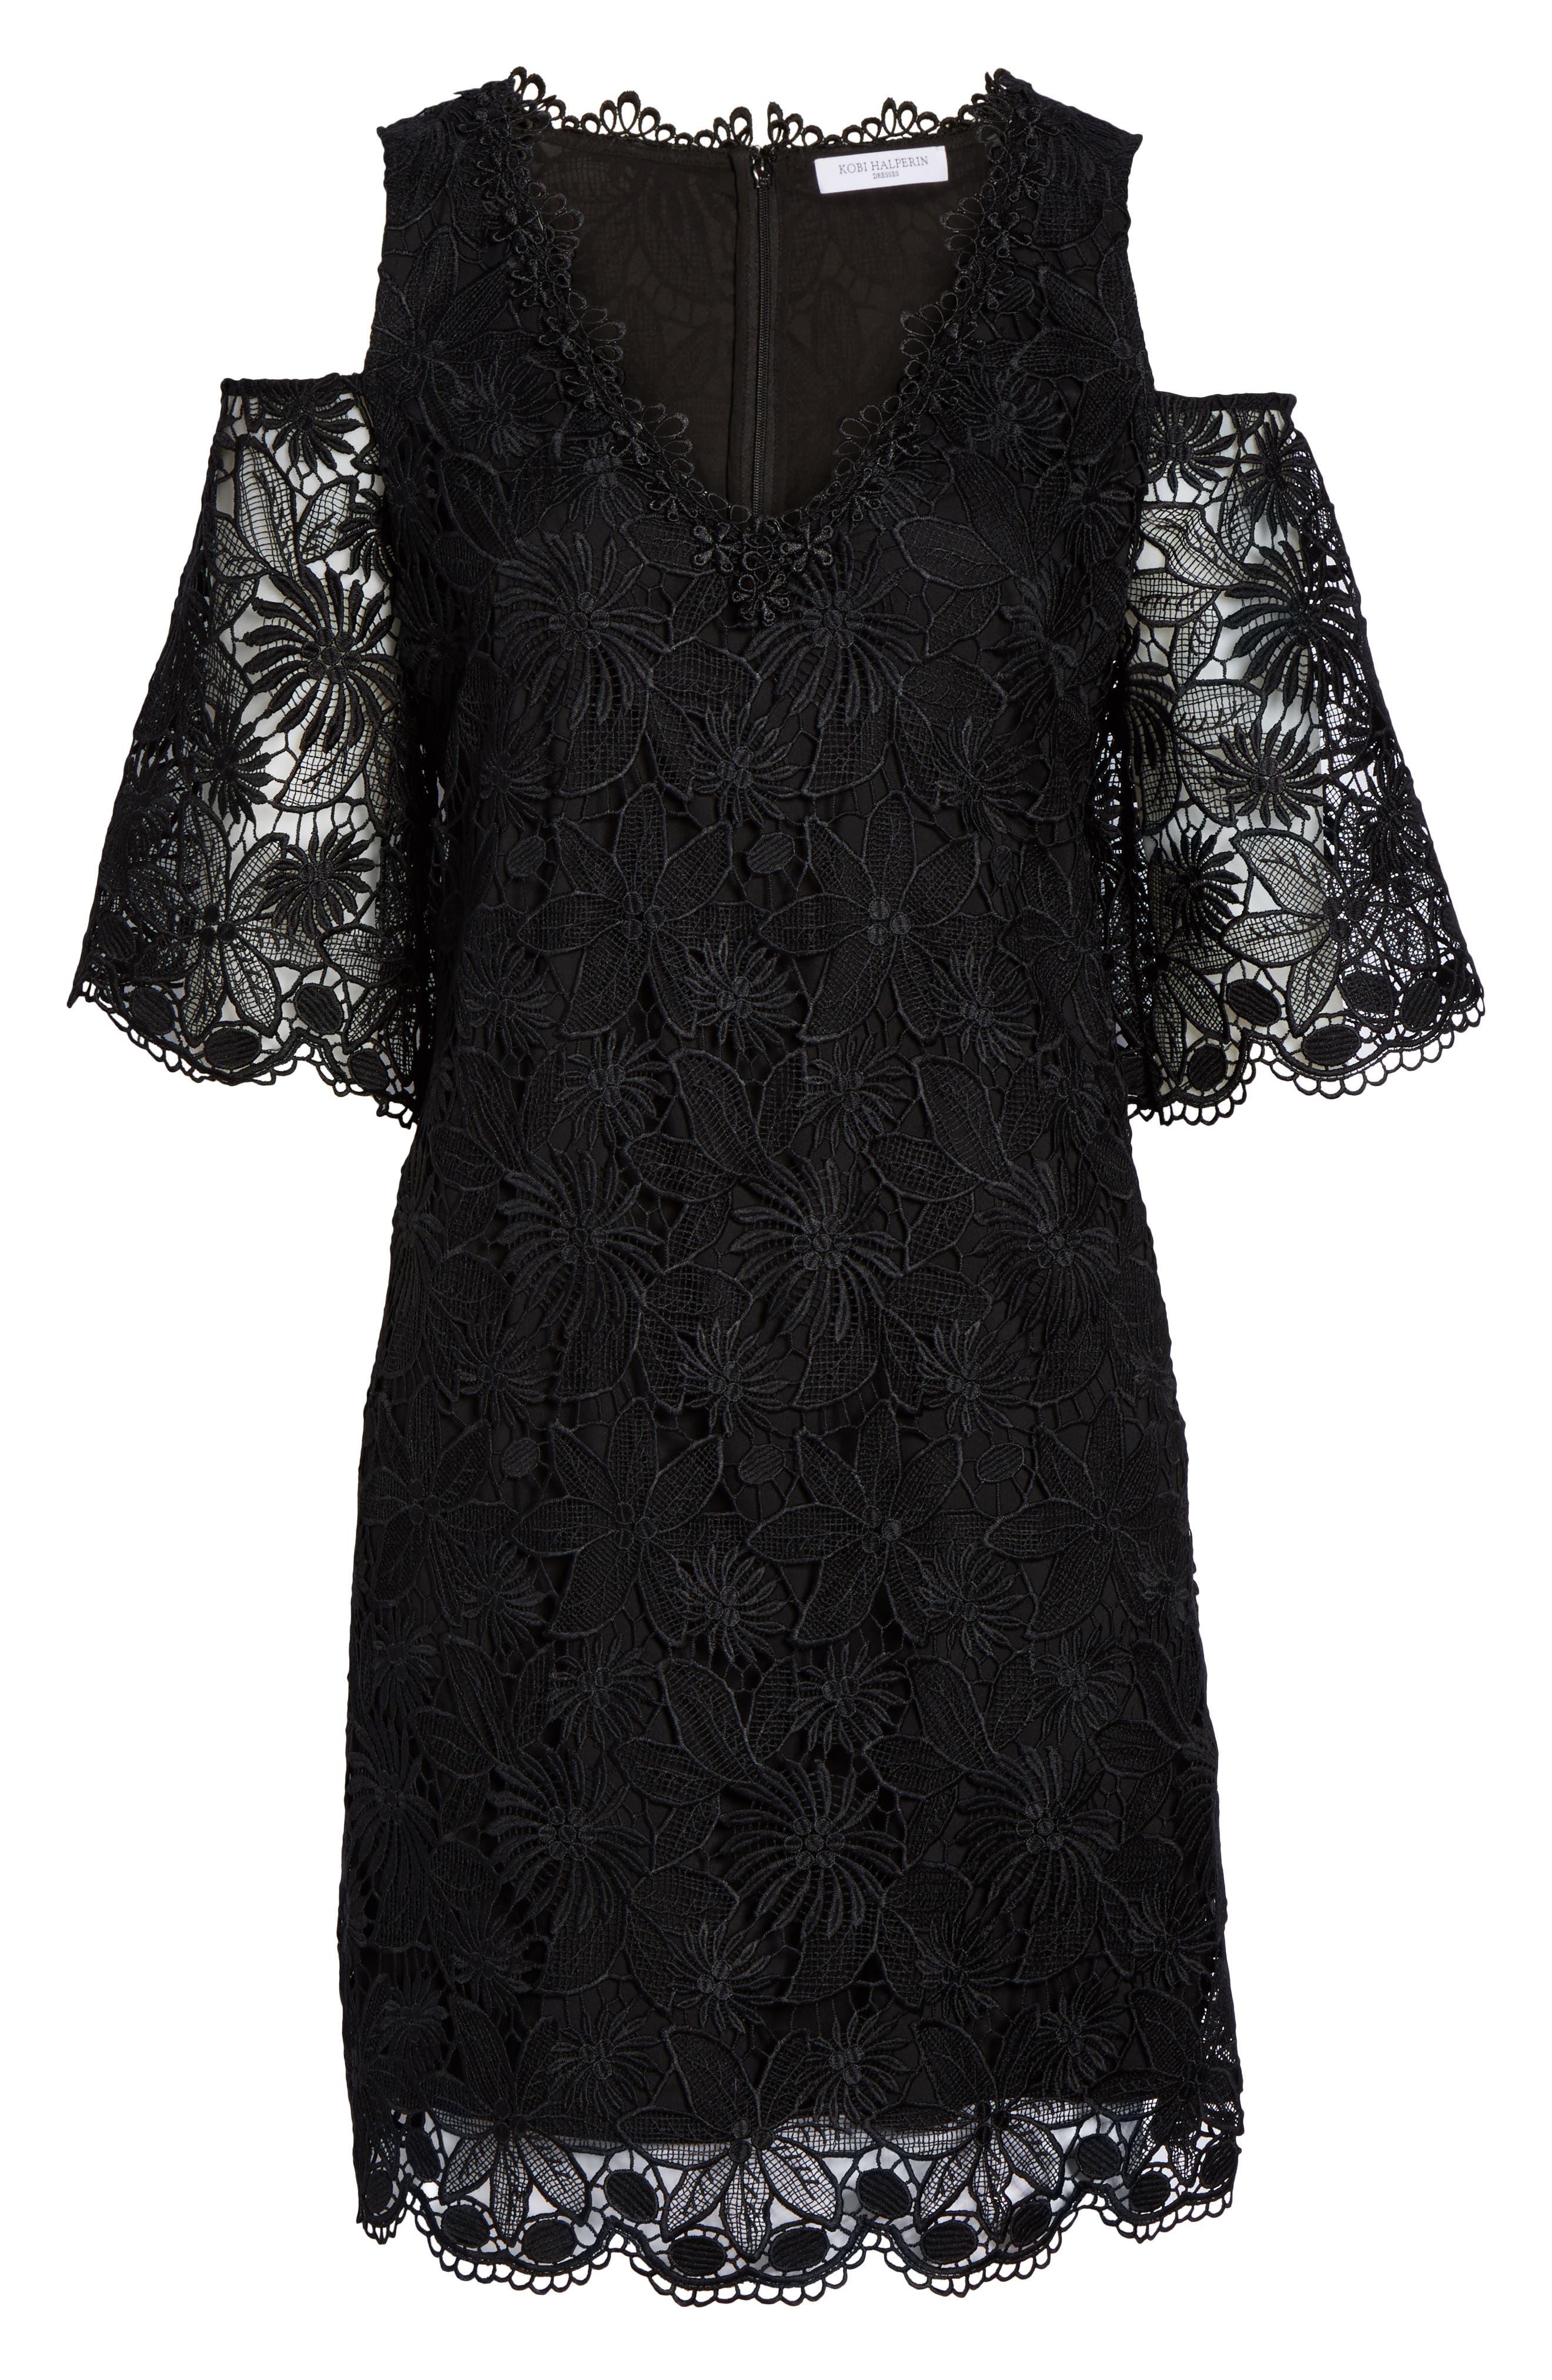 Edna Cold Shoulder Lace Dress,                             Alternate thumbnail 6, color,                             001